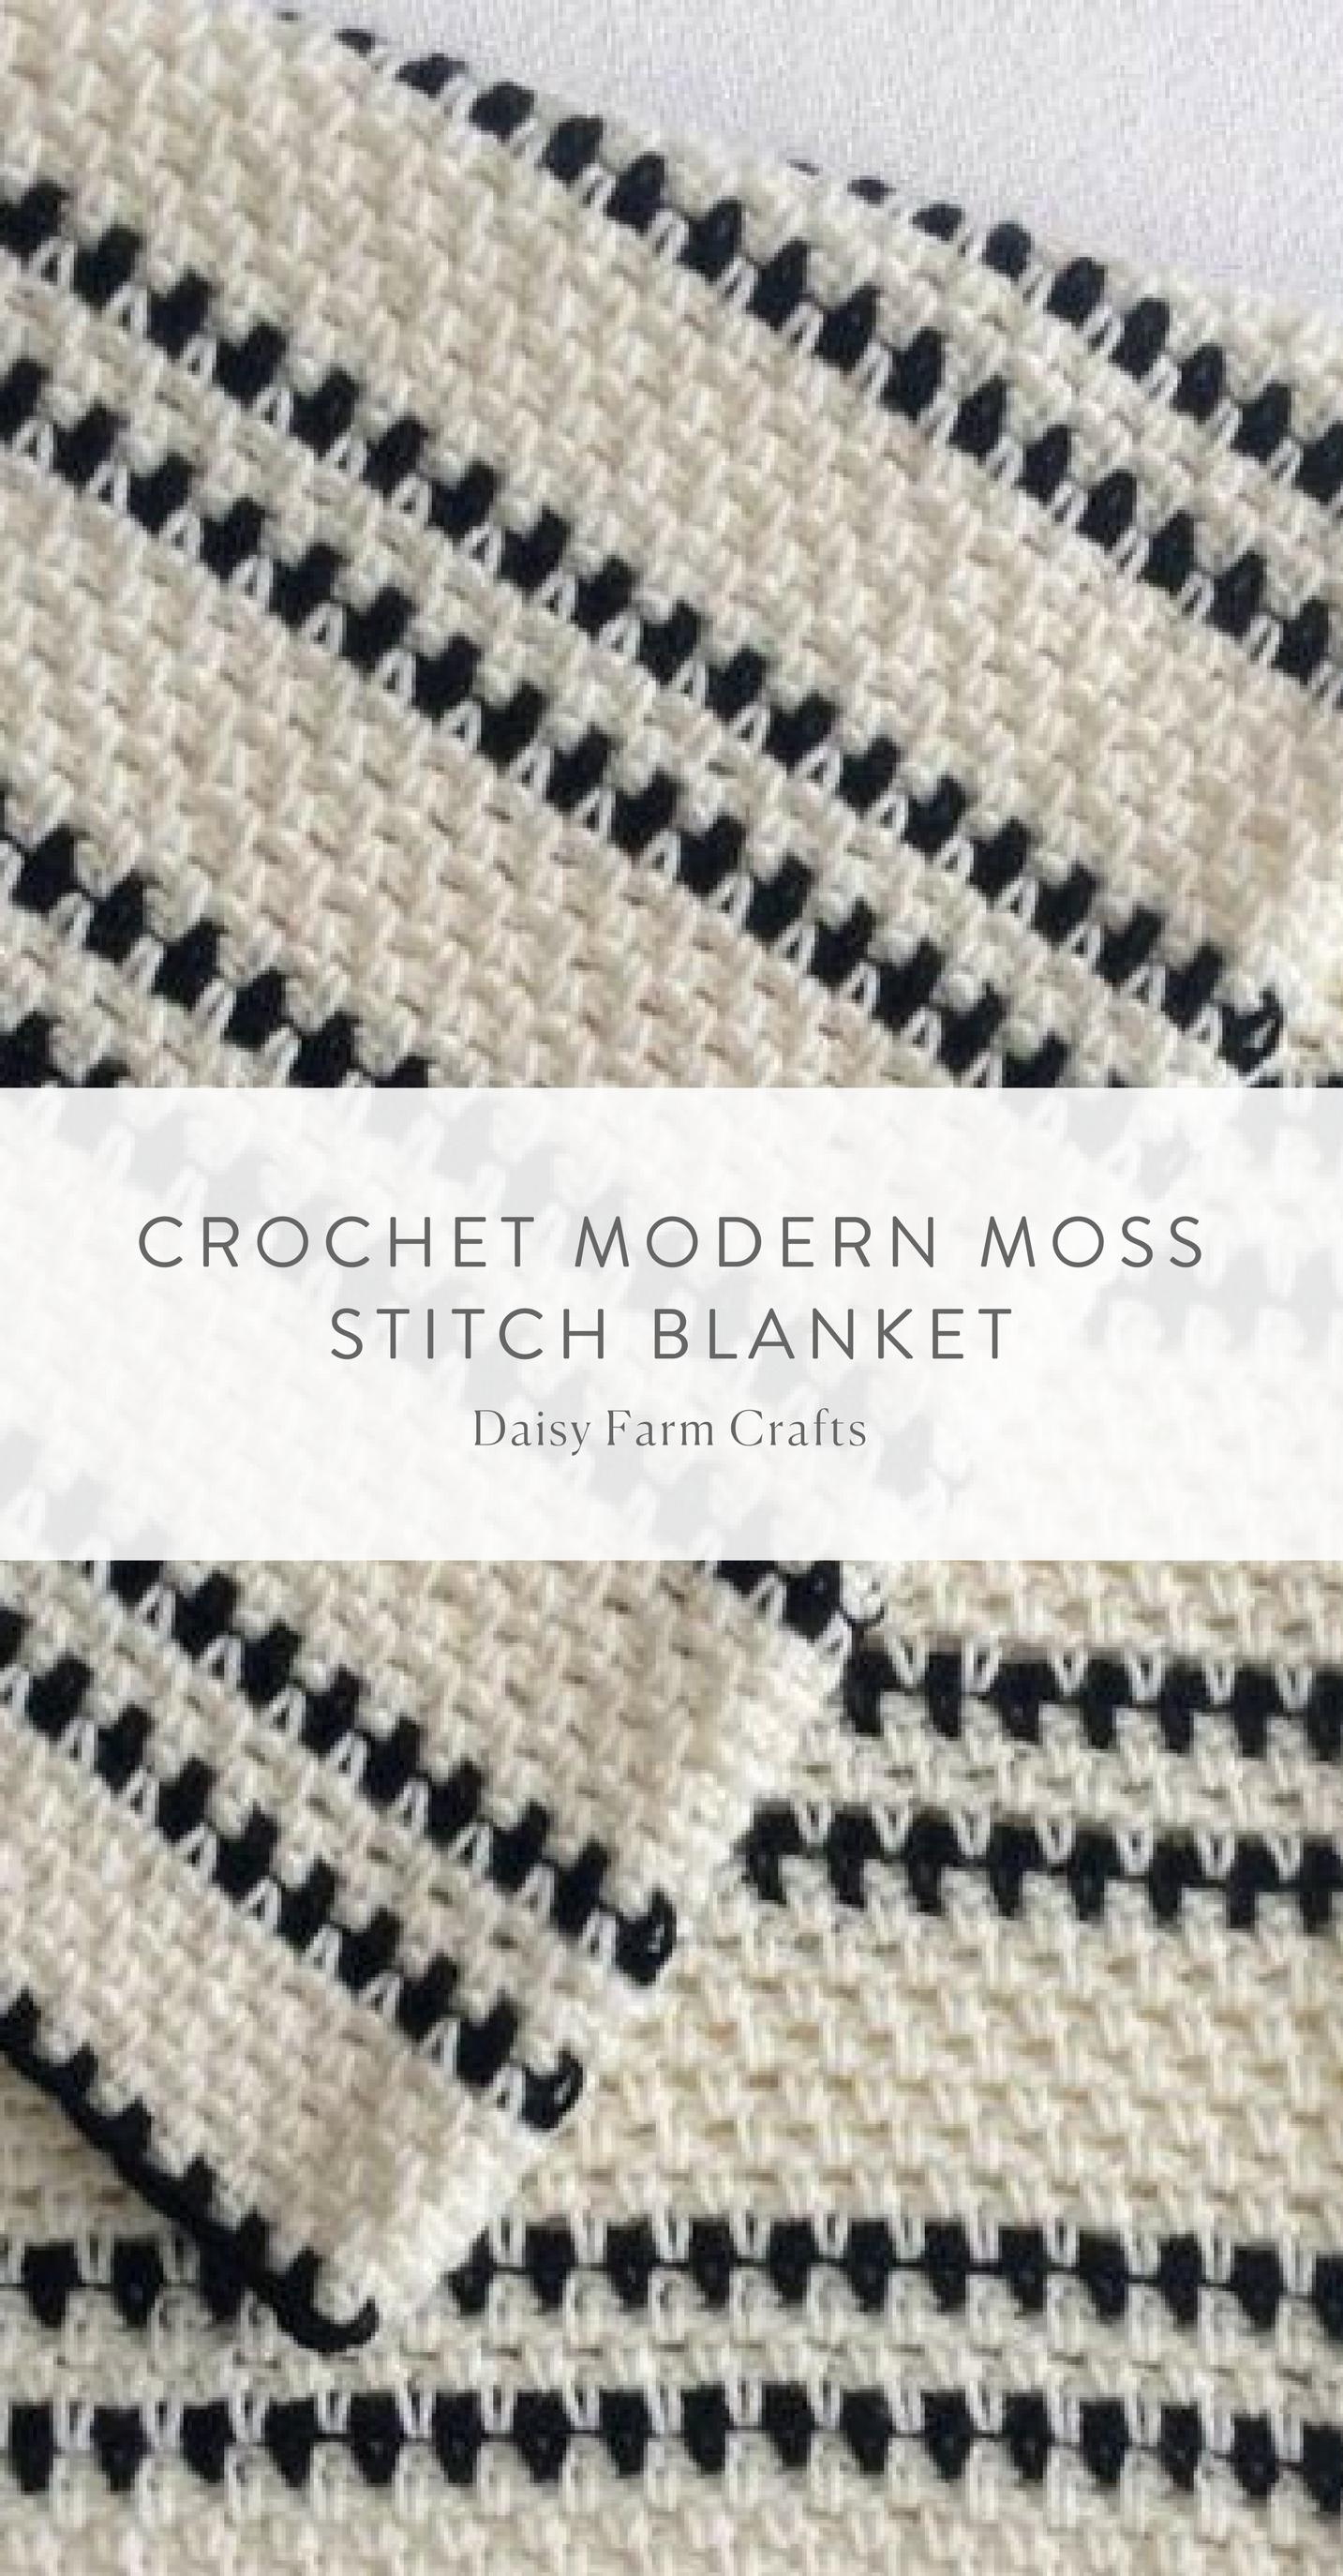 Free Pattern - Crochet Modern Moss Stitch Blanket #crochetstitchespatterns